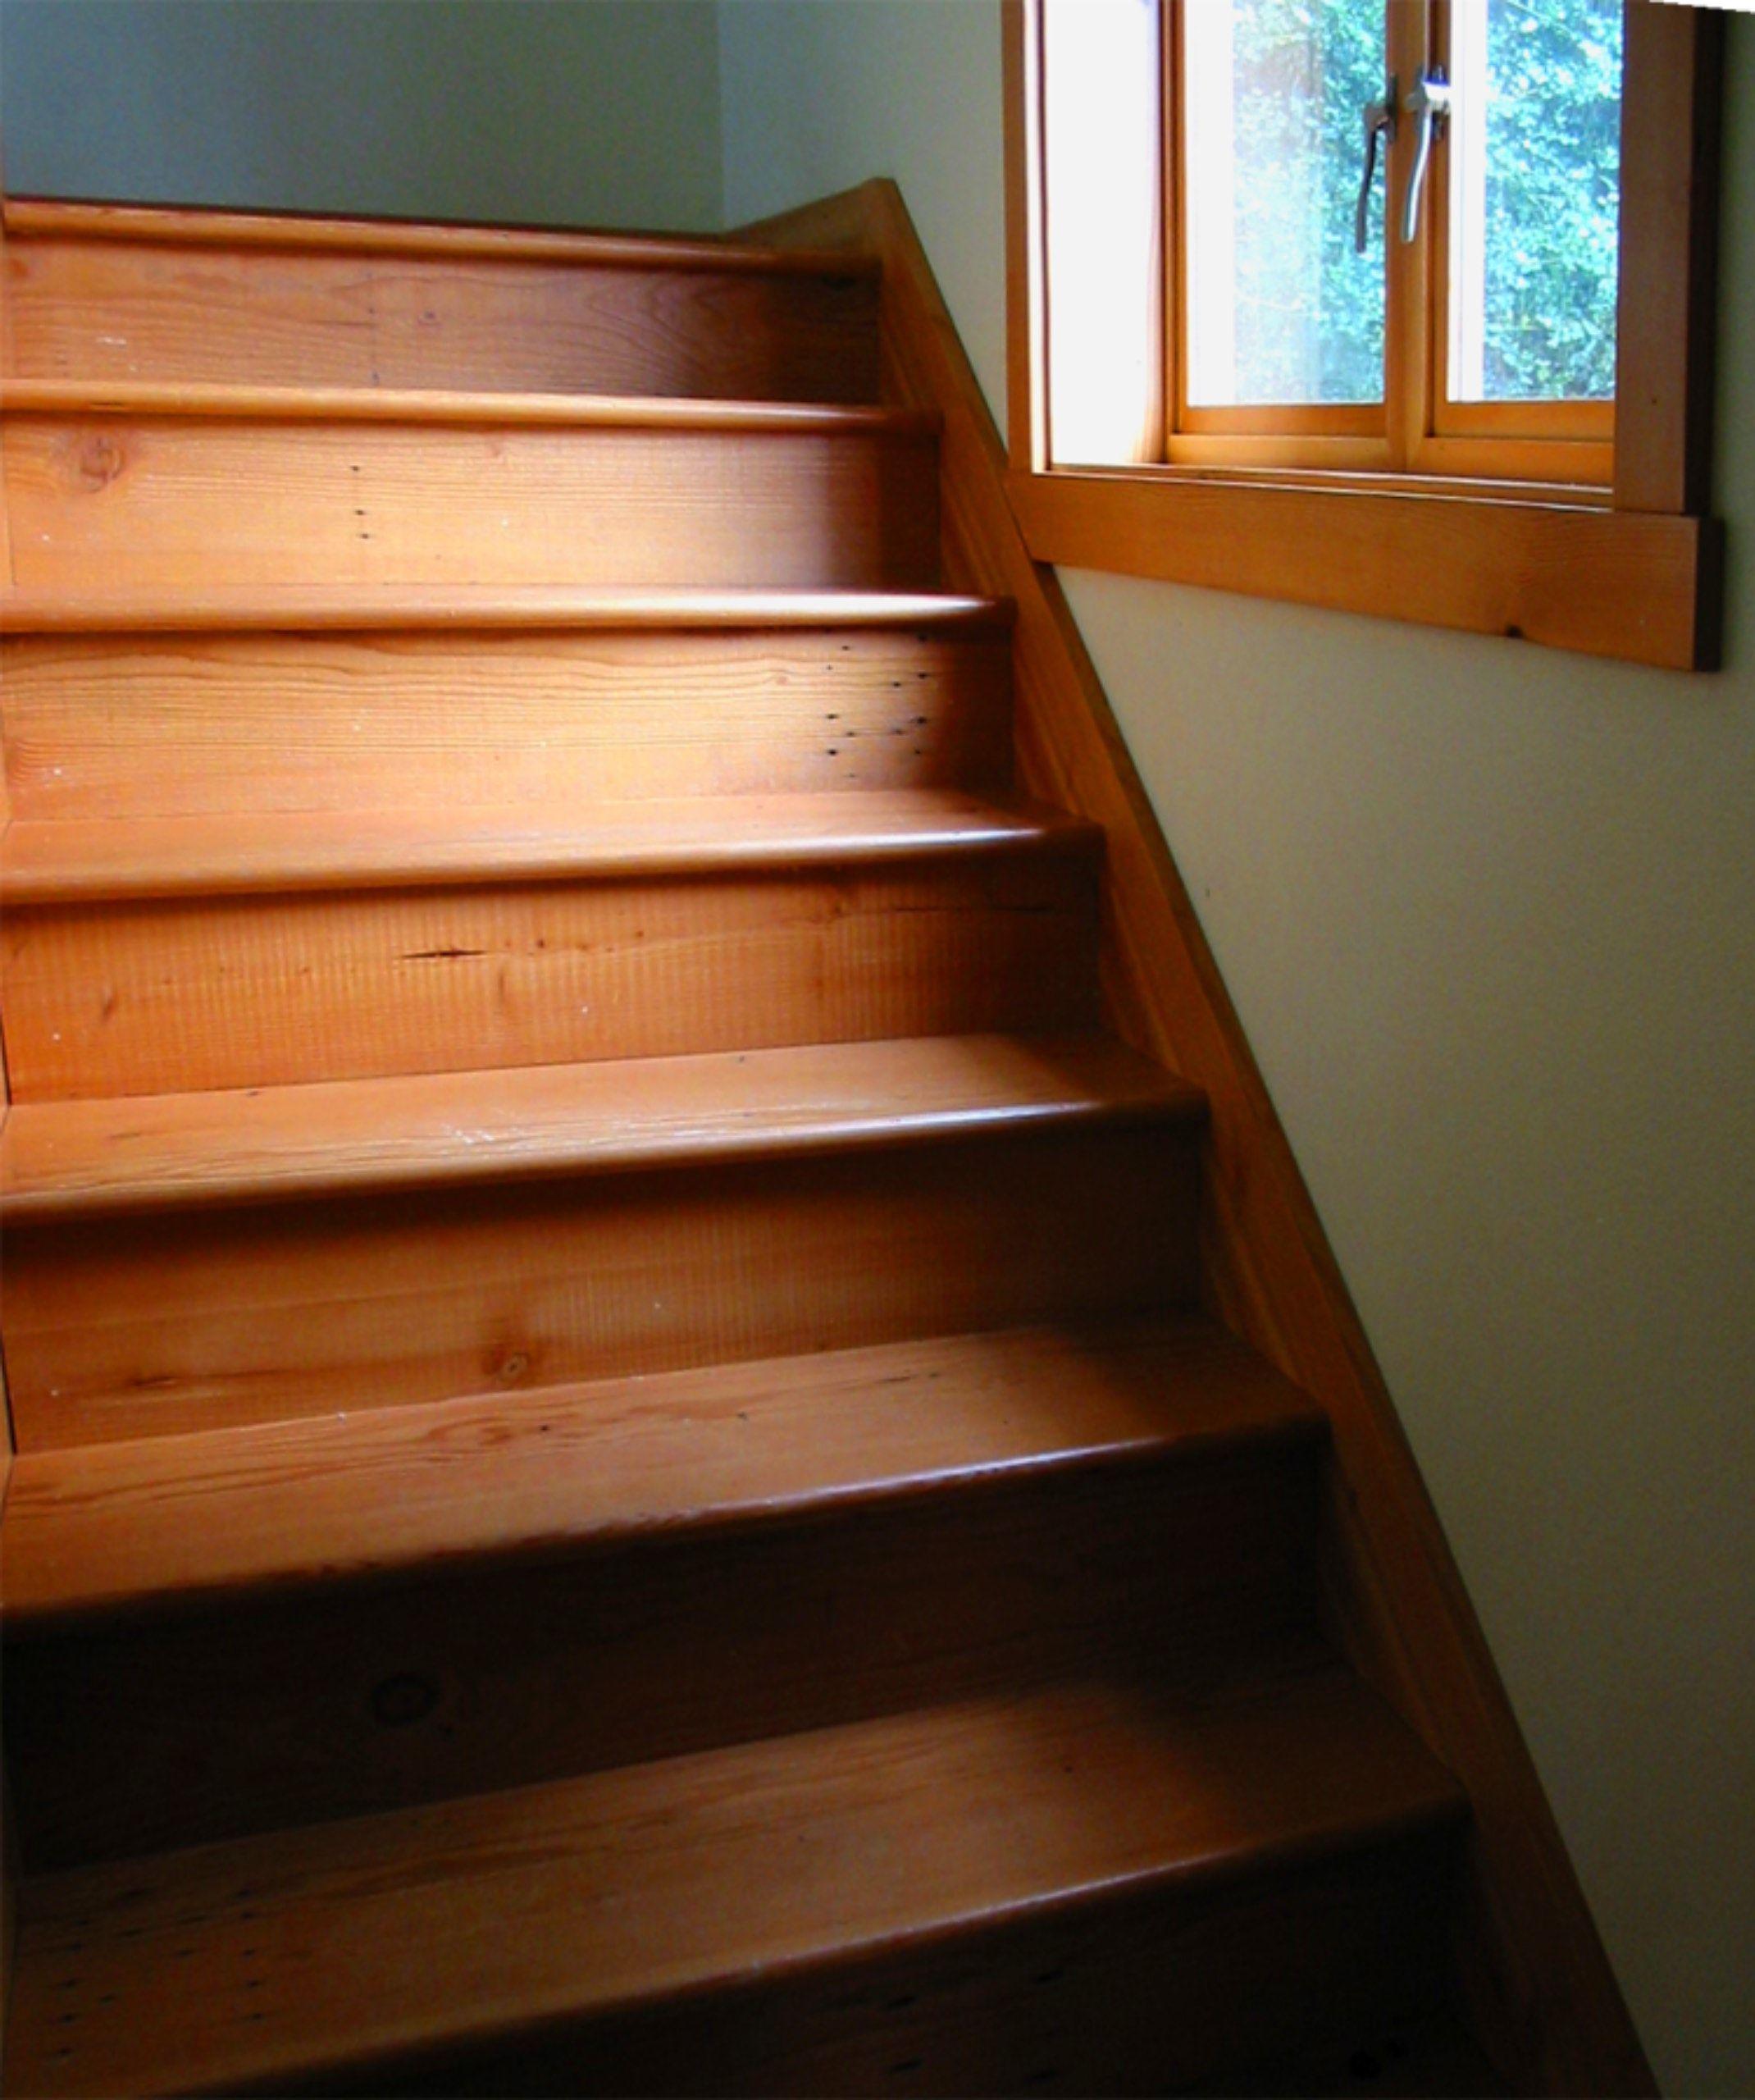 Recycle fir stair